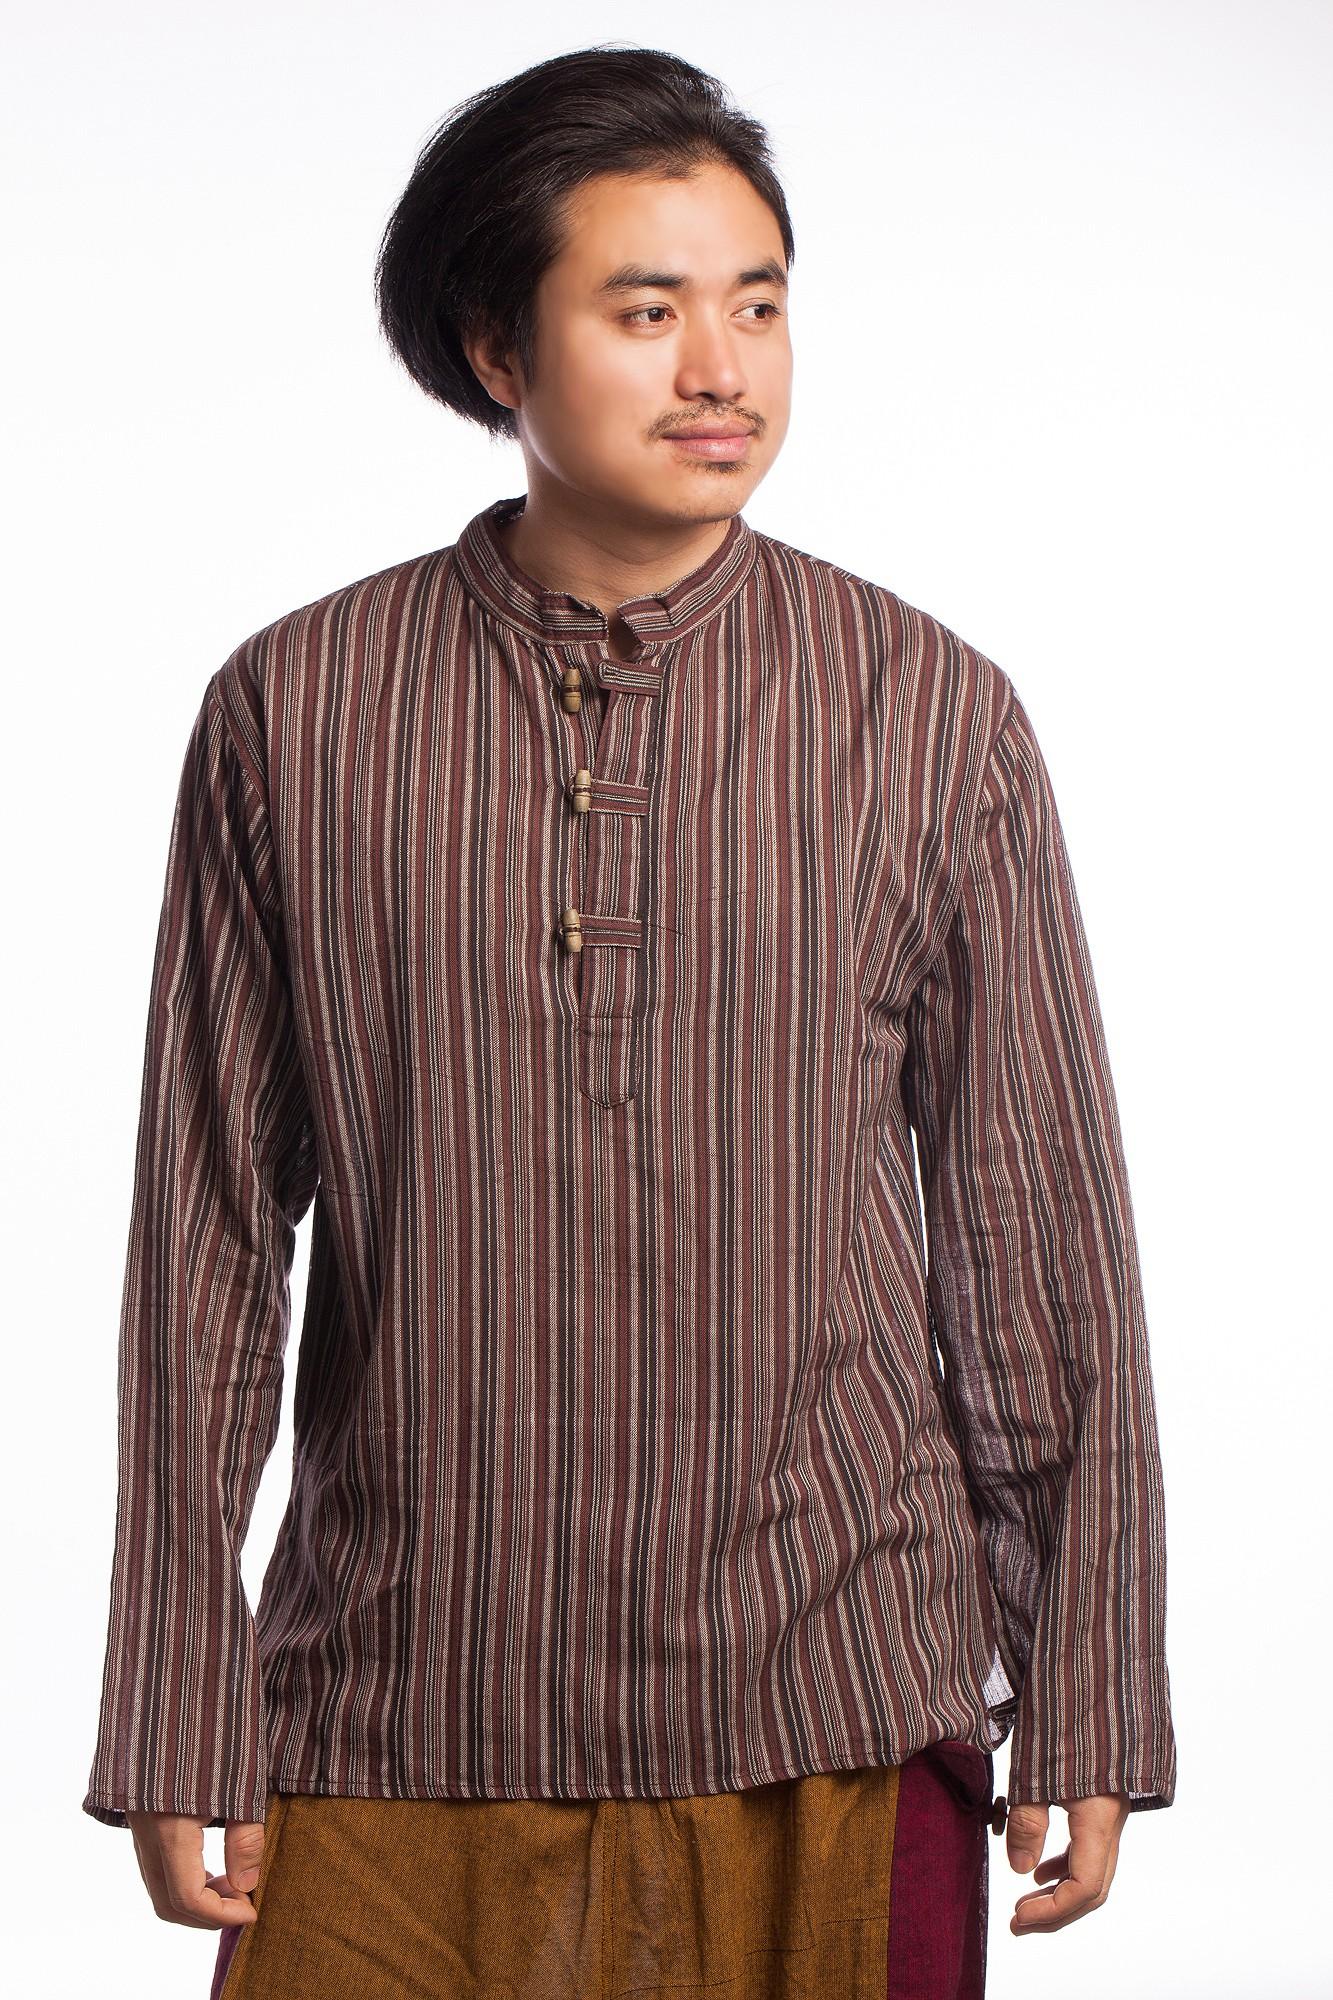 Bluza etnica in dungi de culori inchise si maneca lunga